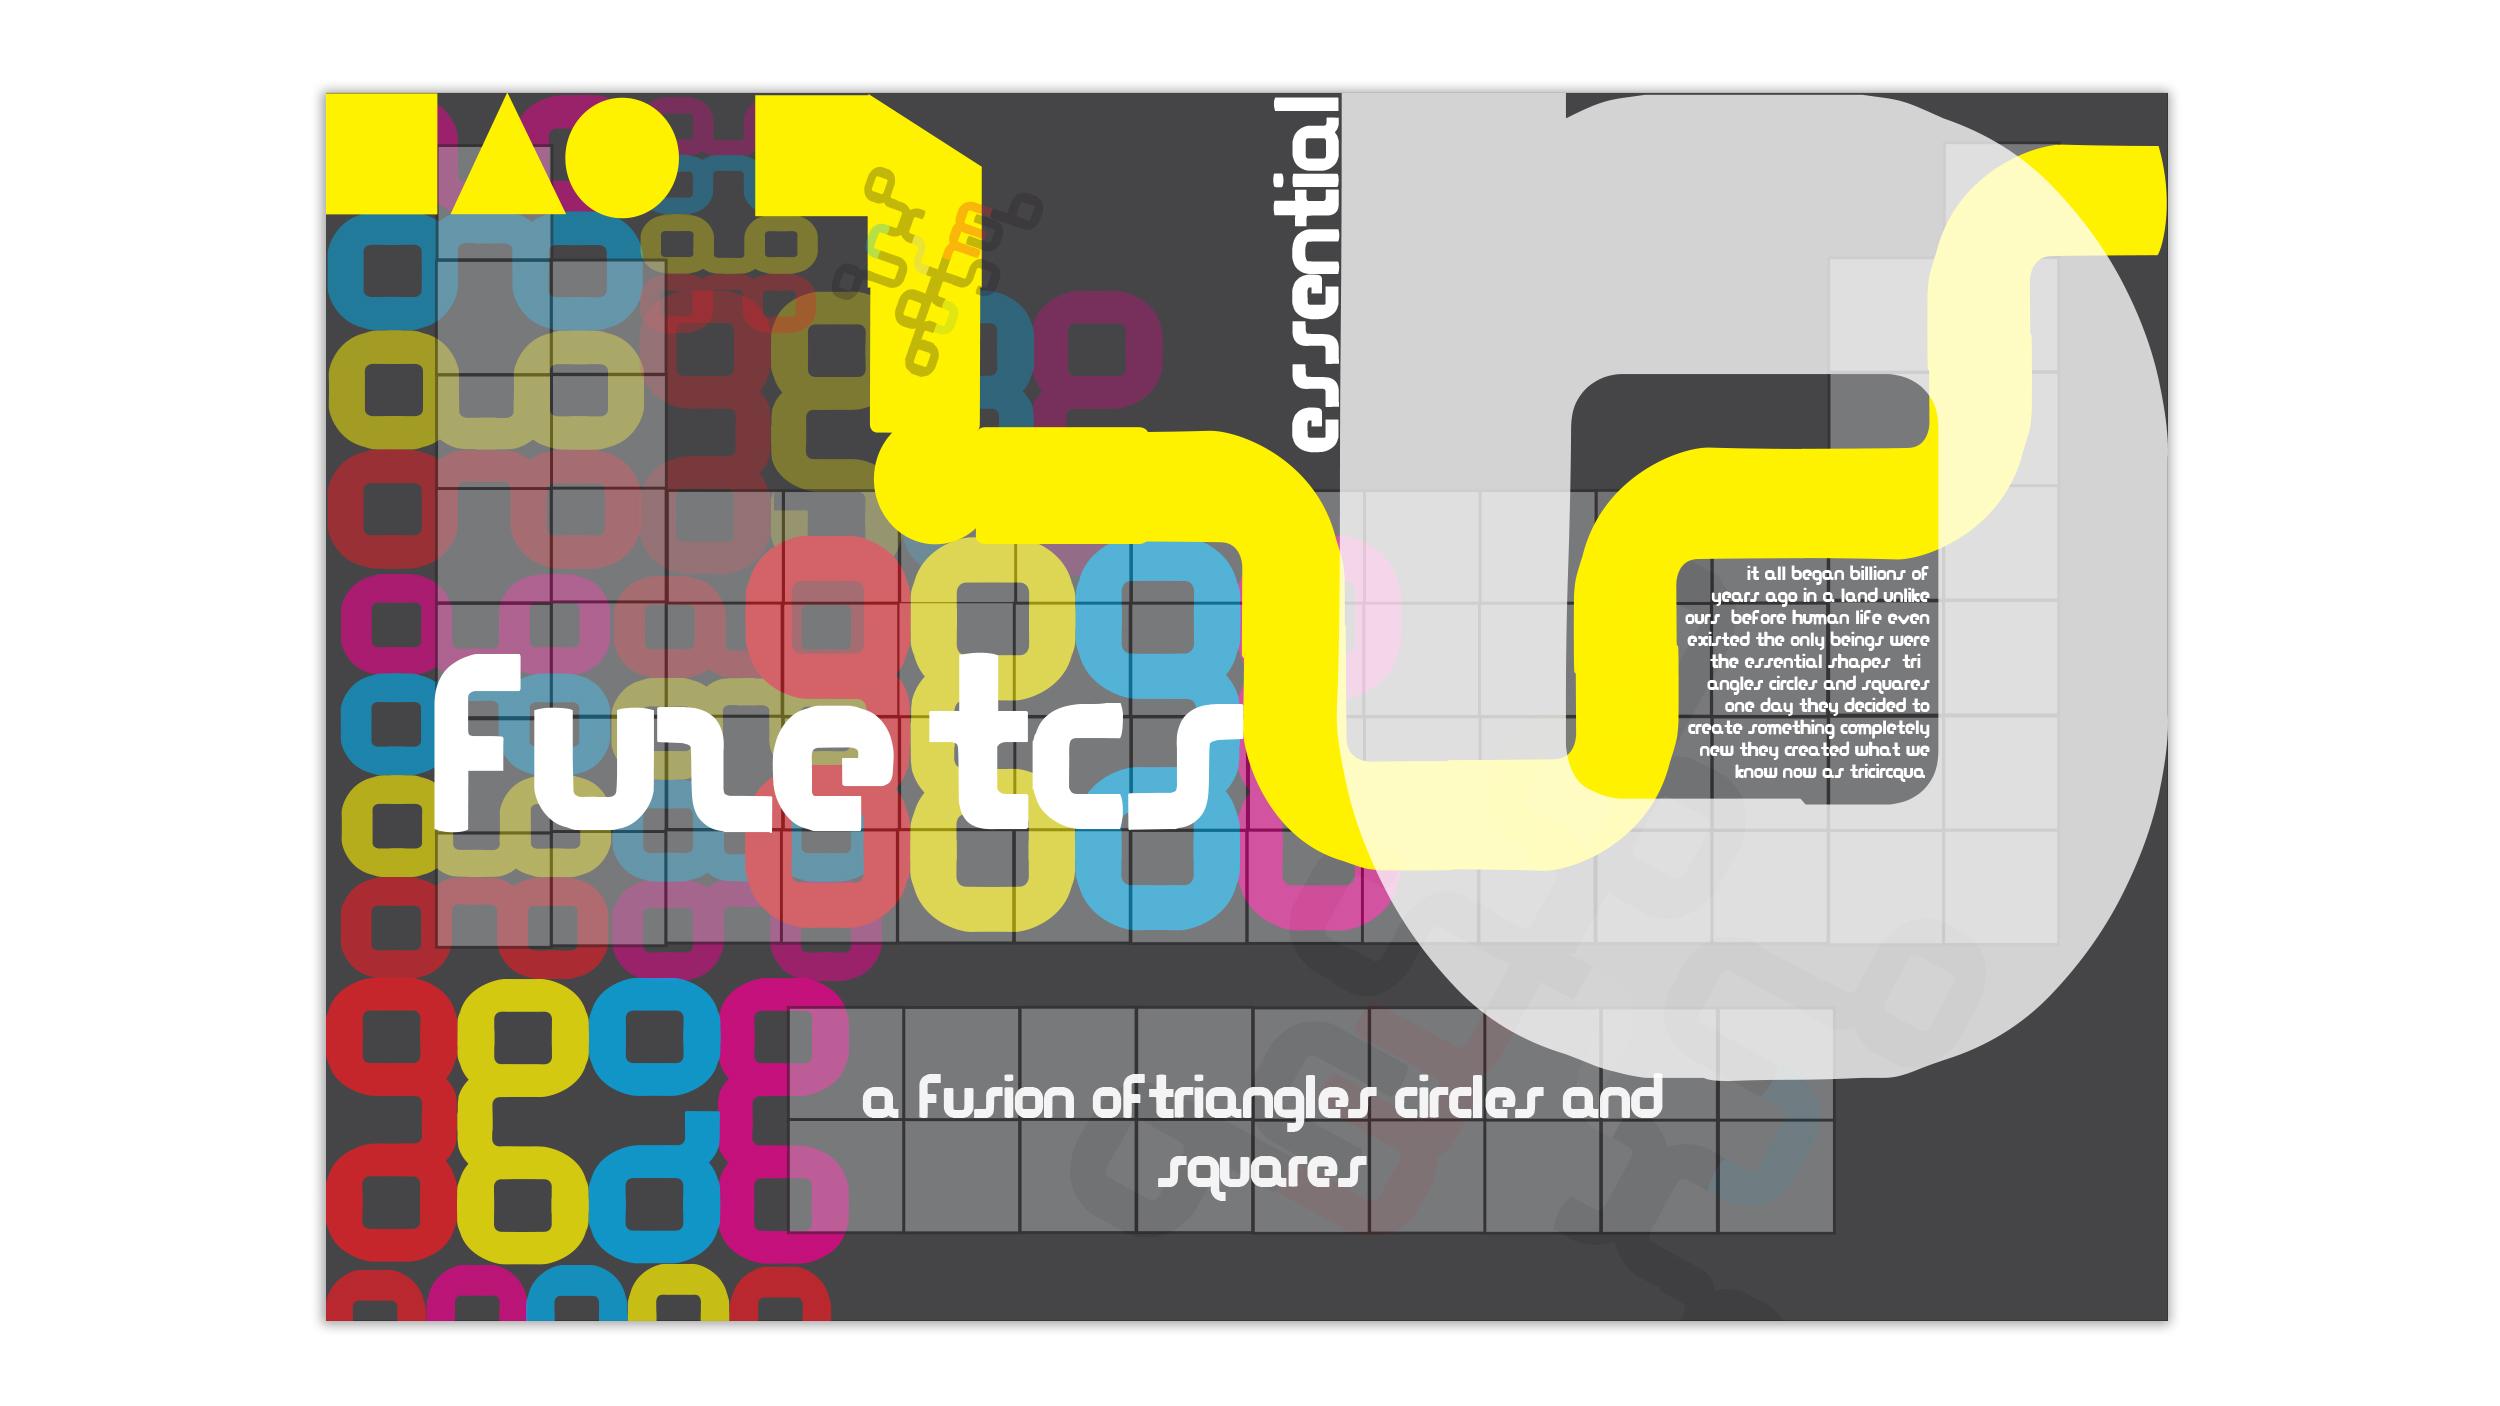 reba-joy-billips-typeface-poster-2500x1406-r1.jpg